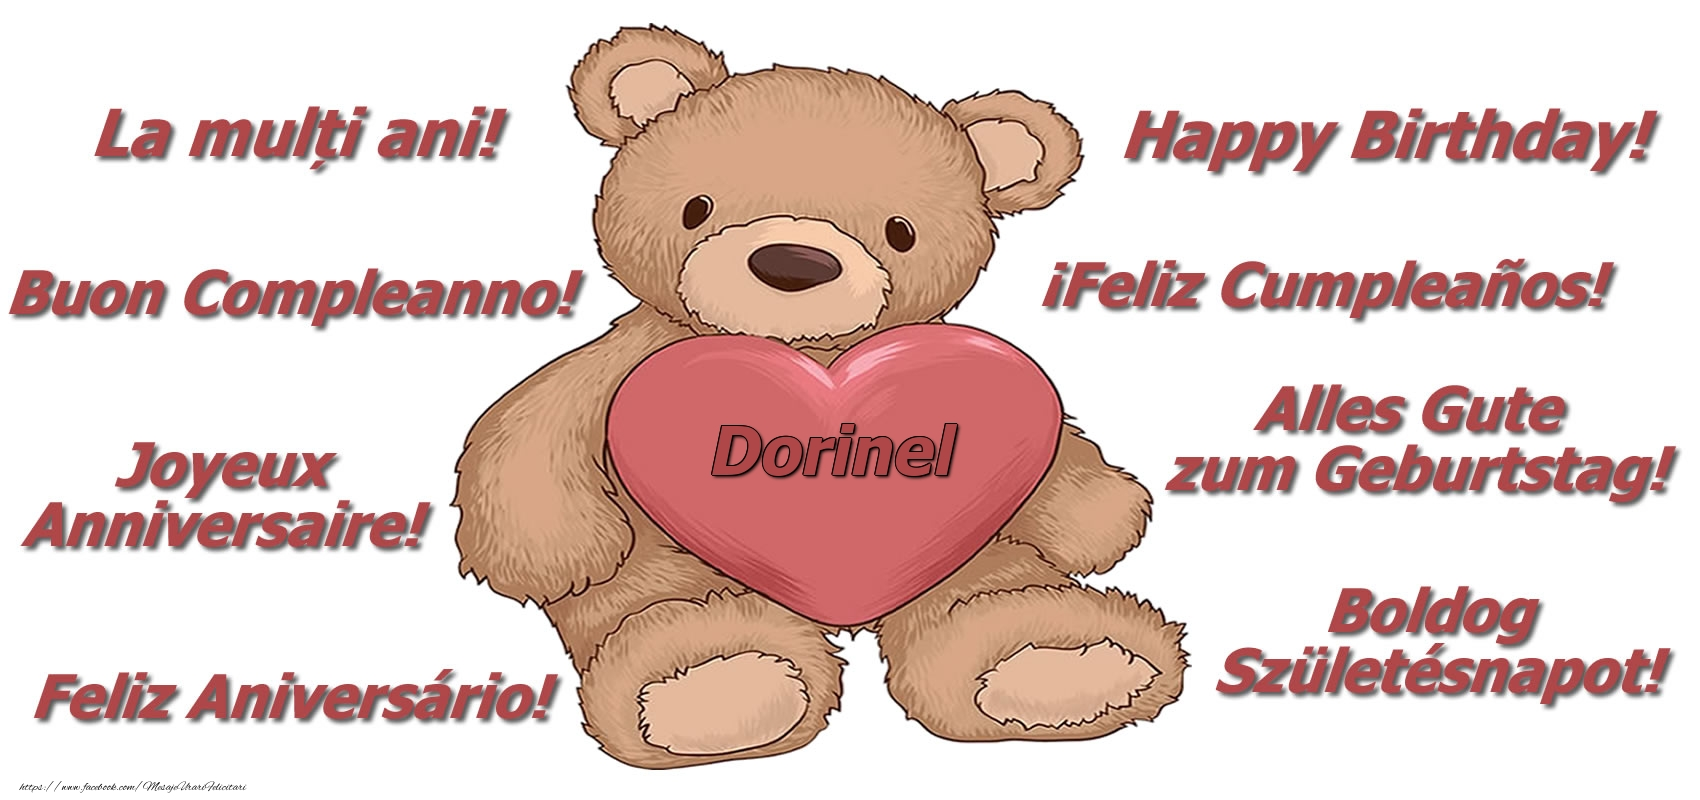 Felicitari de zi de nastere - La multi ani Dorinel! - Ursulet